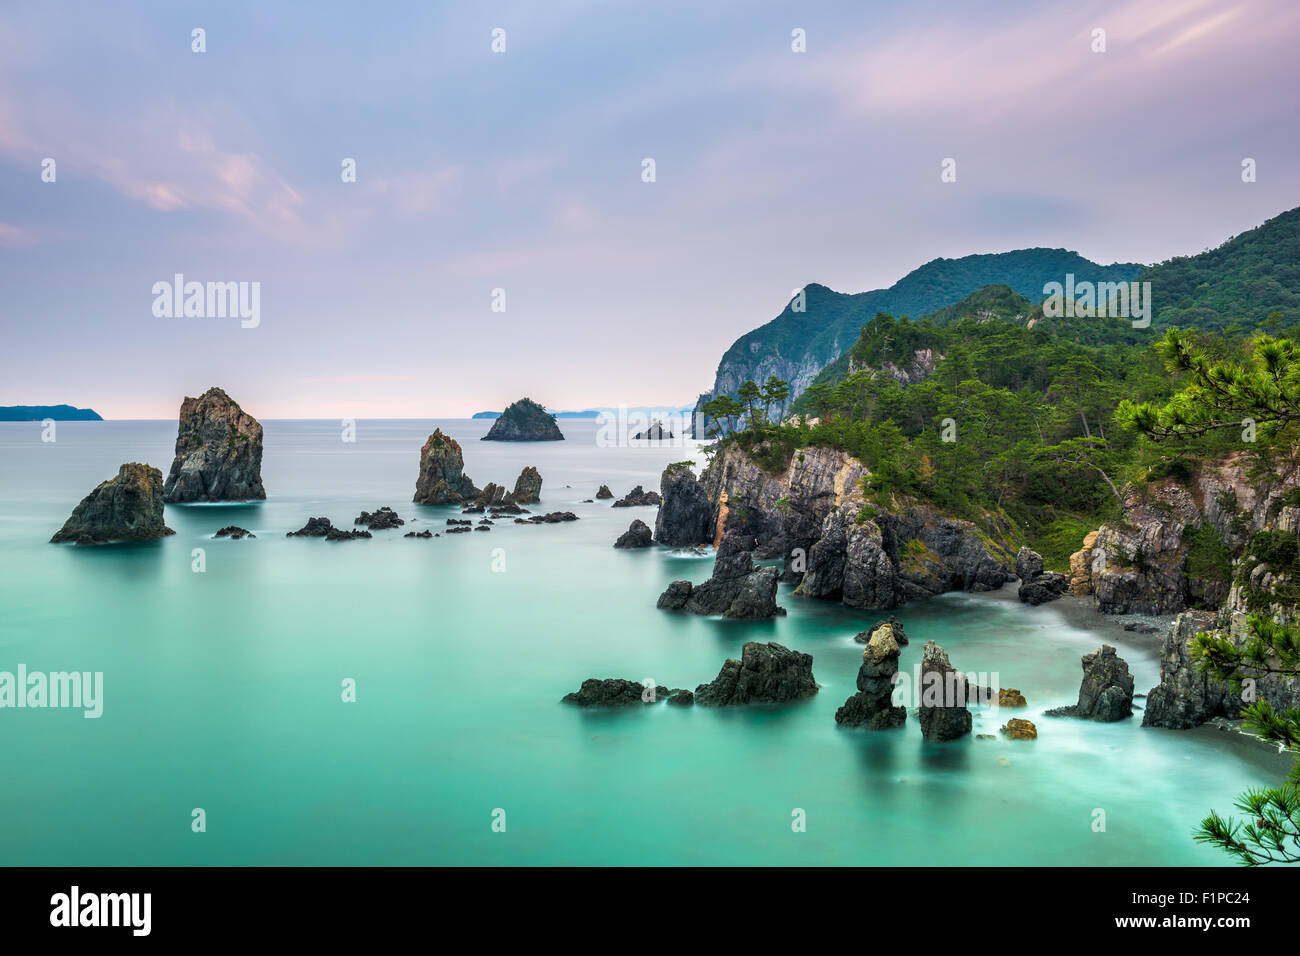 Omijima Island, Yamaguchi, Japan rocky coast on the Sea of Japan. - Stock Image